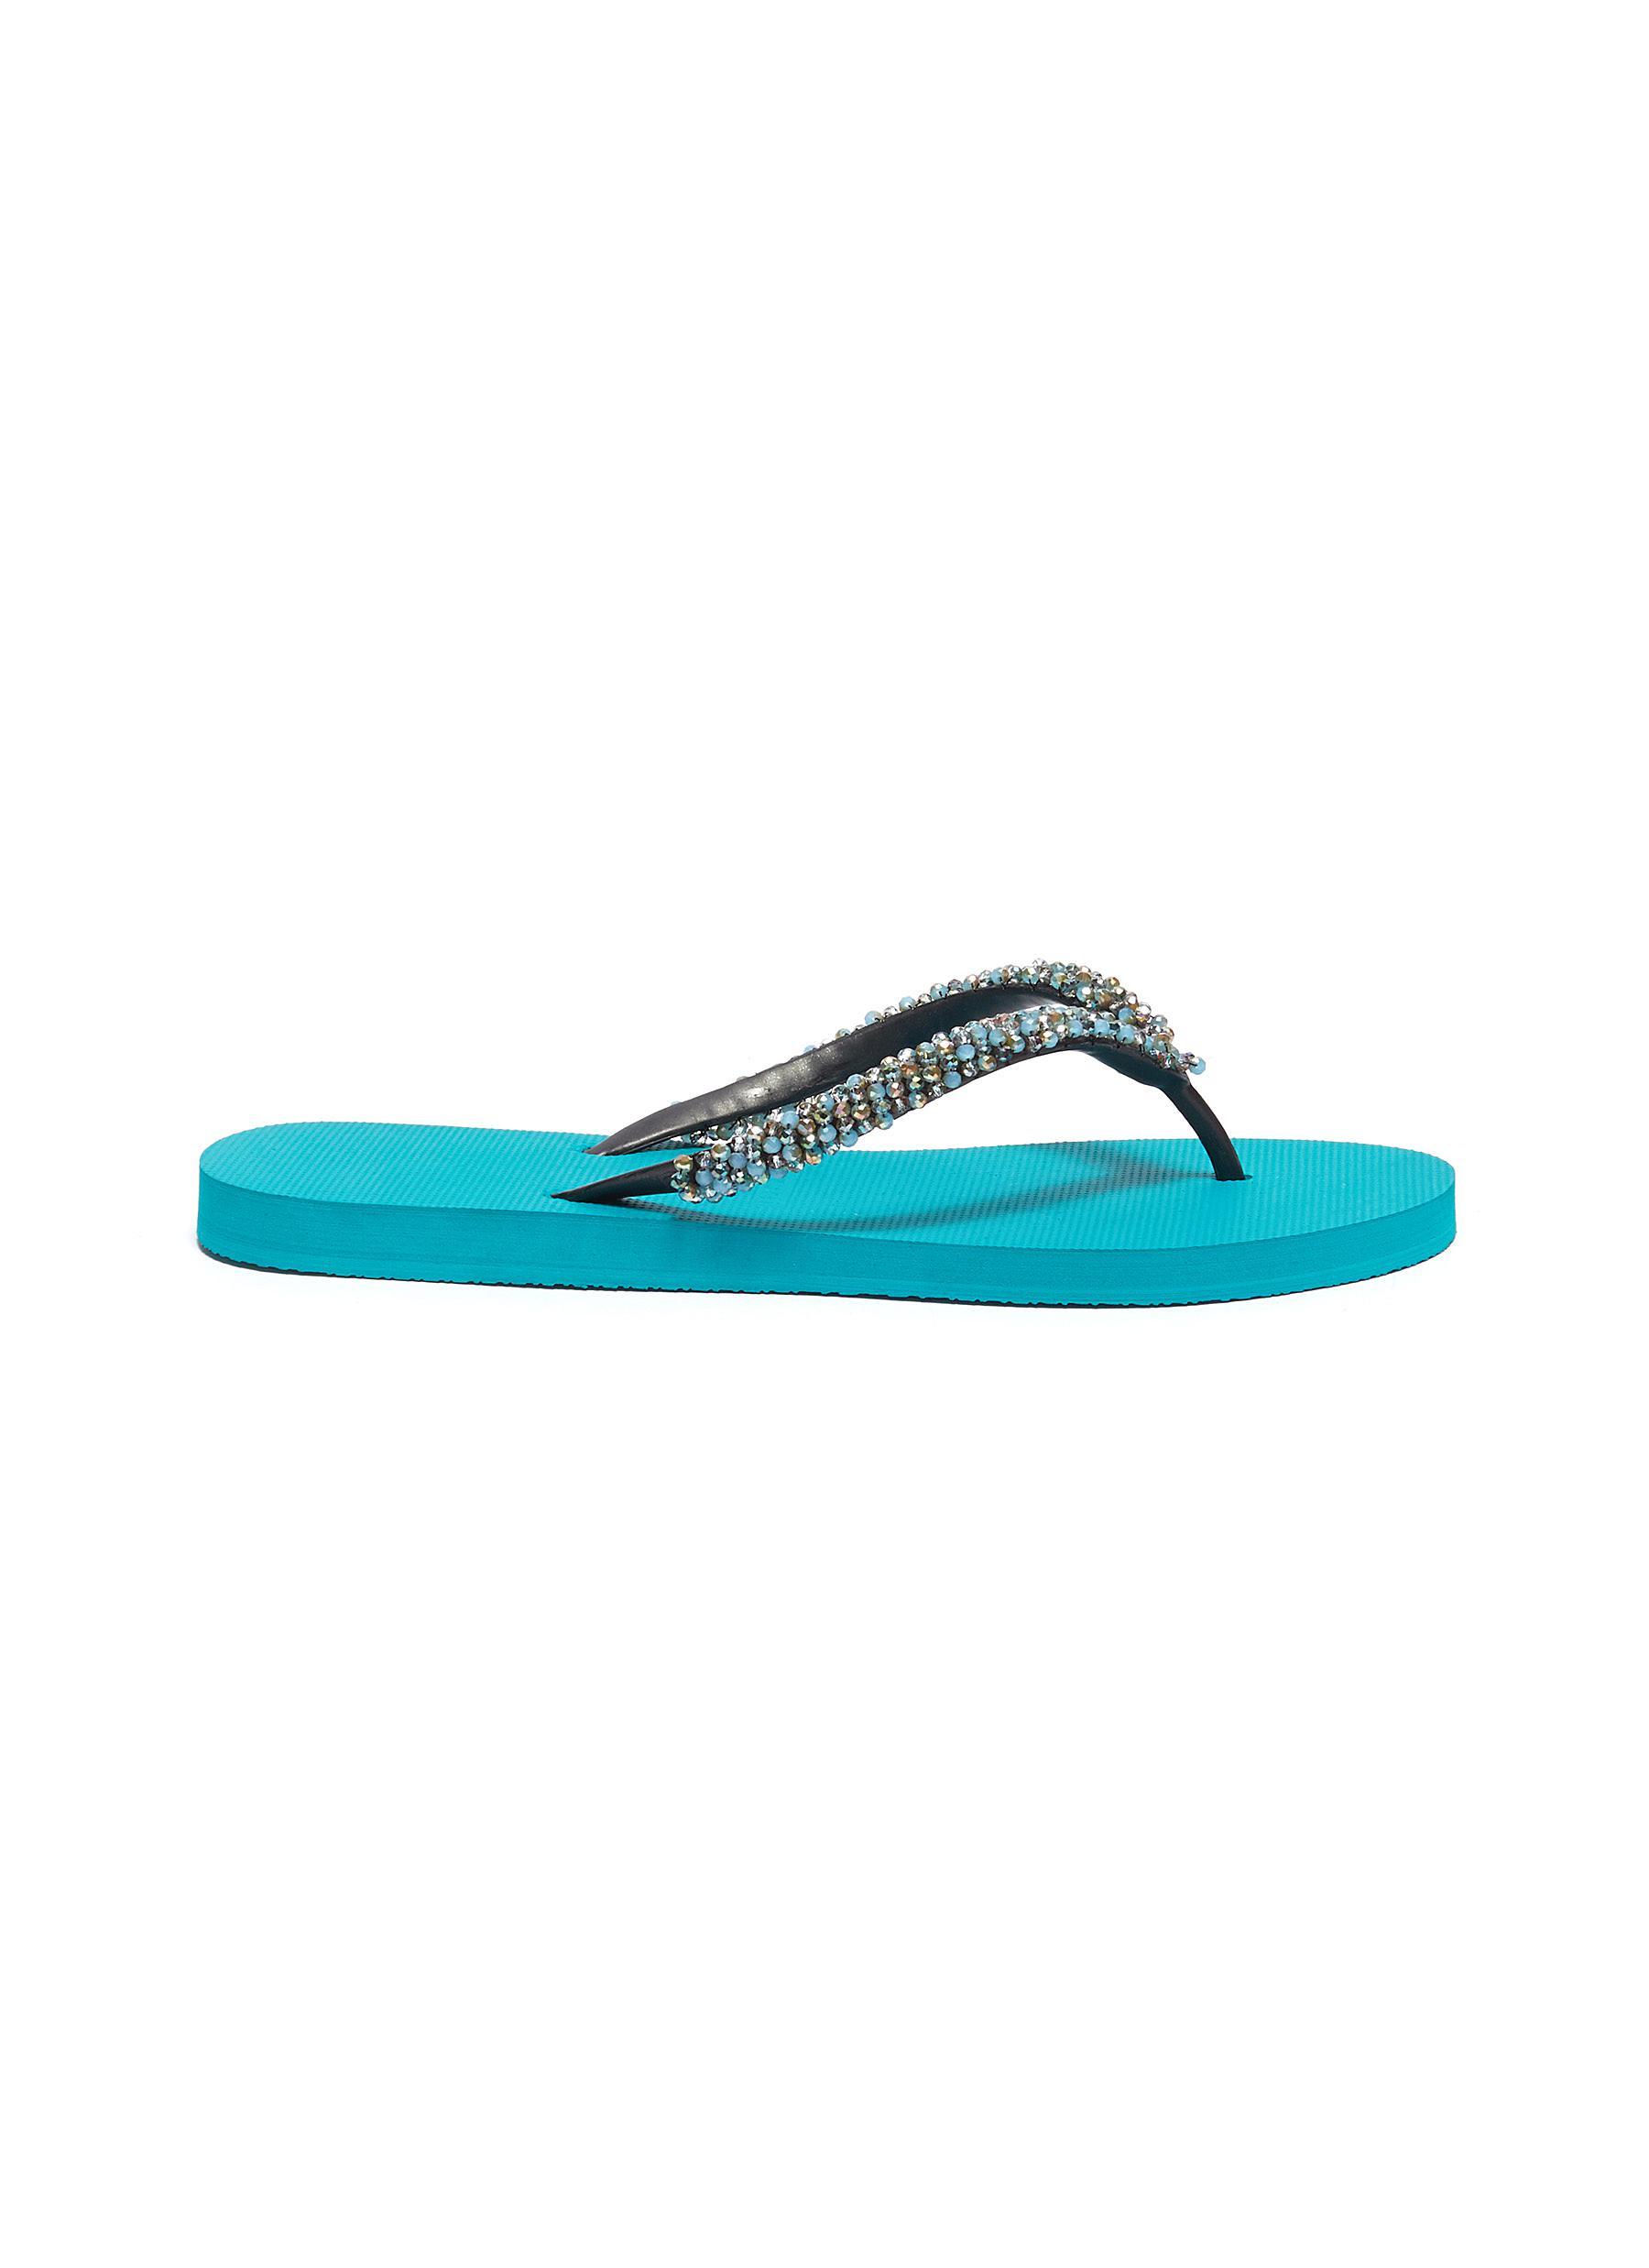 5f02d6384 Uzurii.  Precious Classic  crystal PVC thong sandals